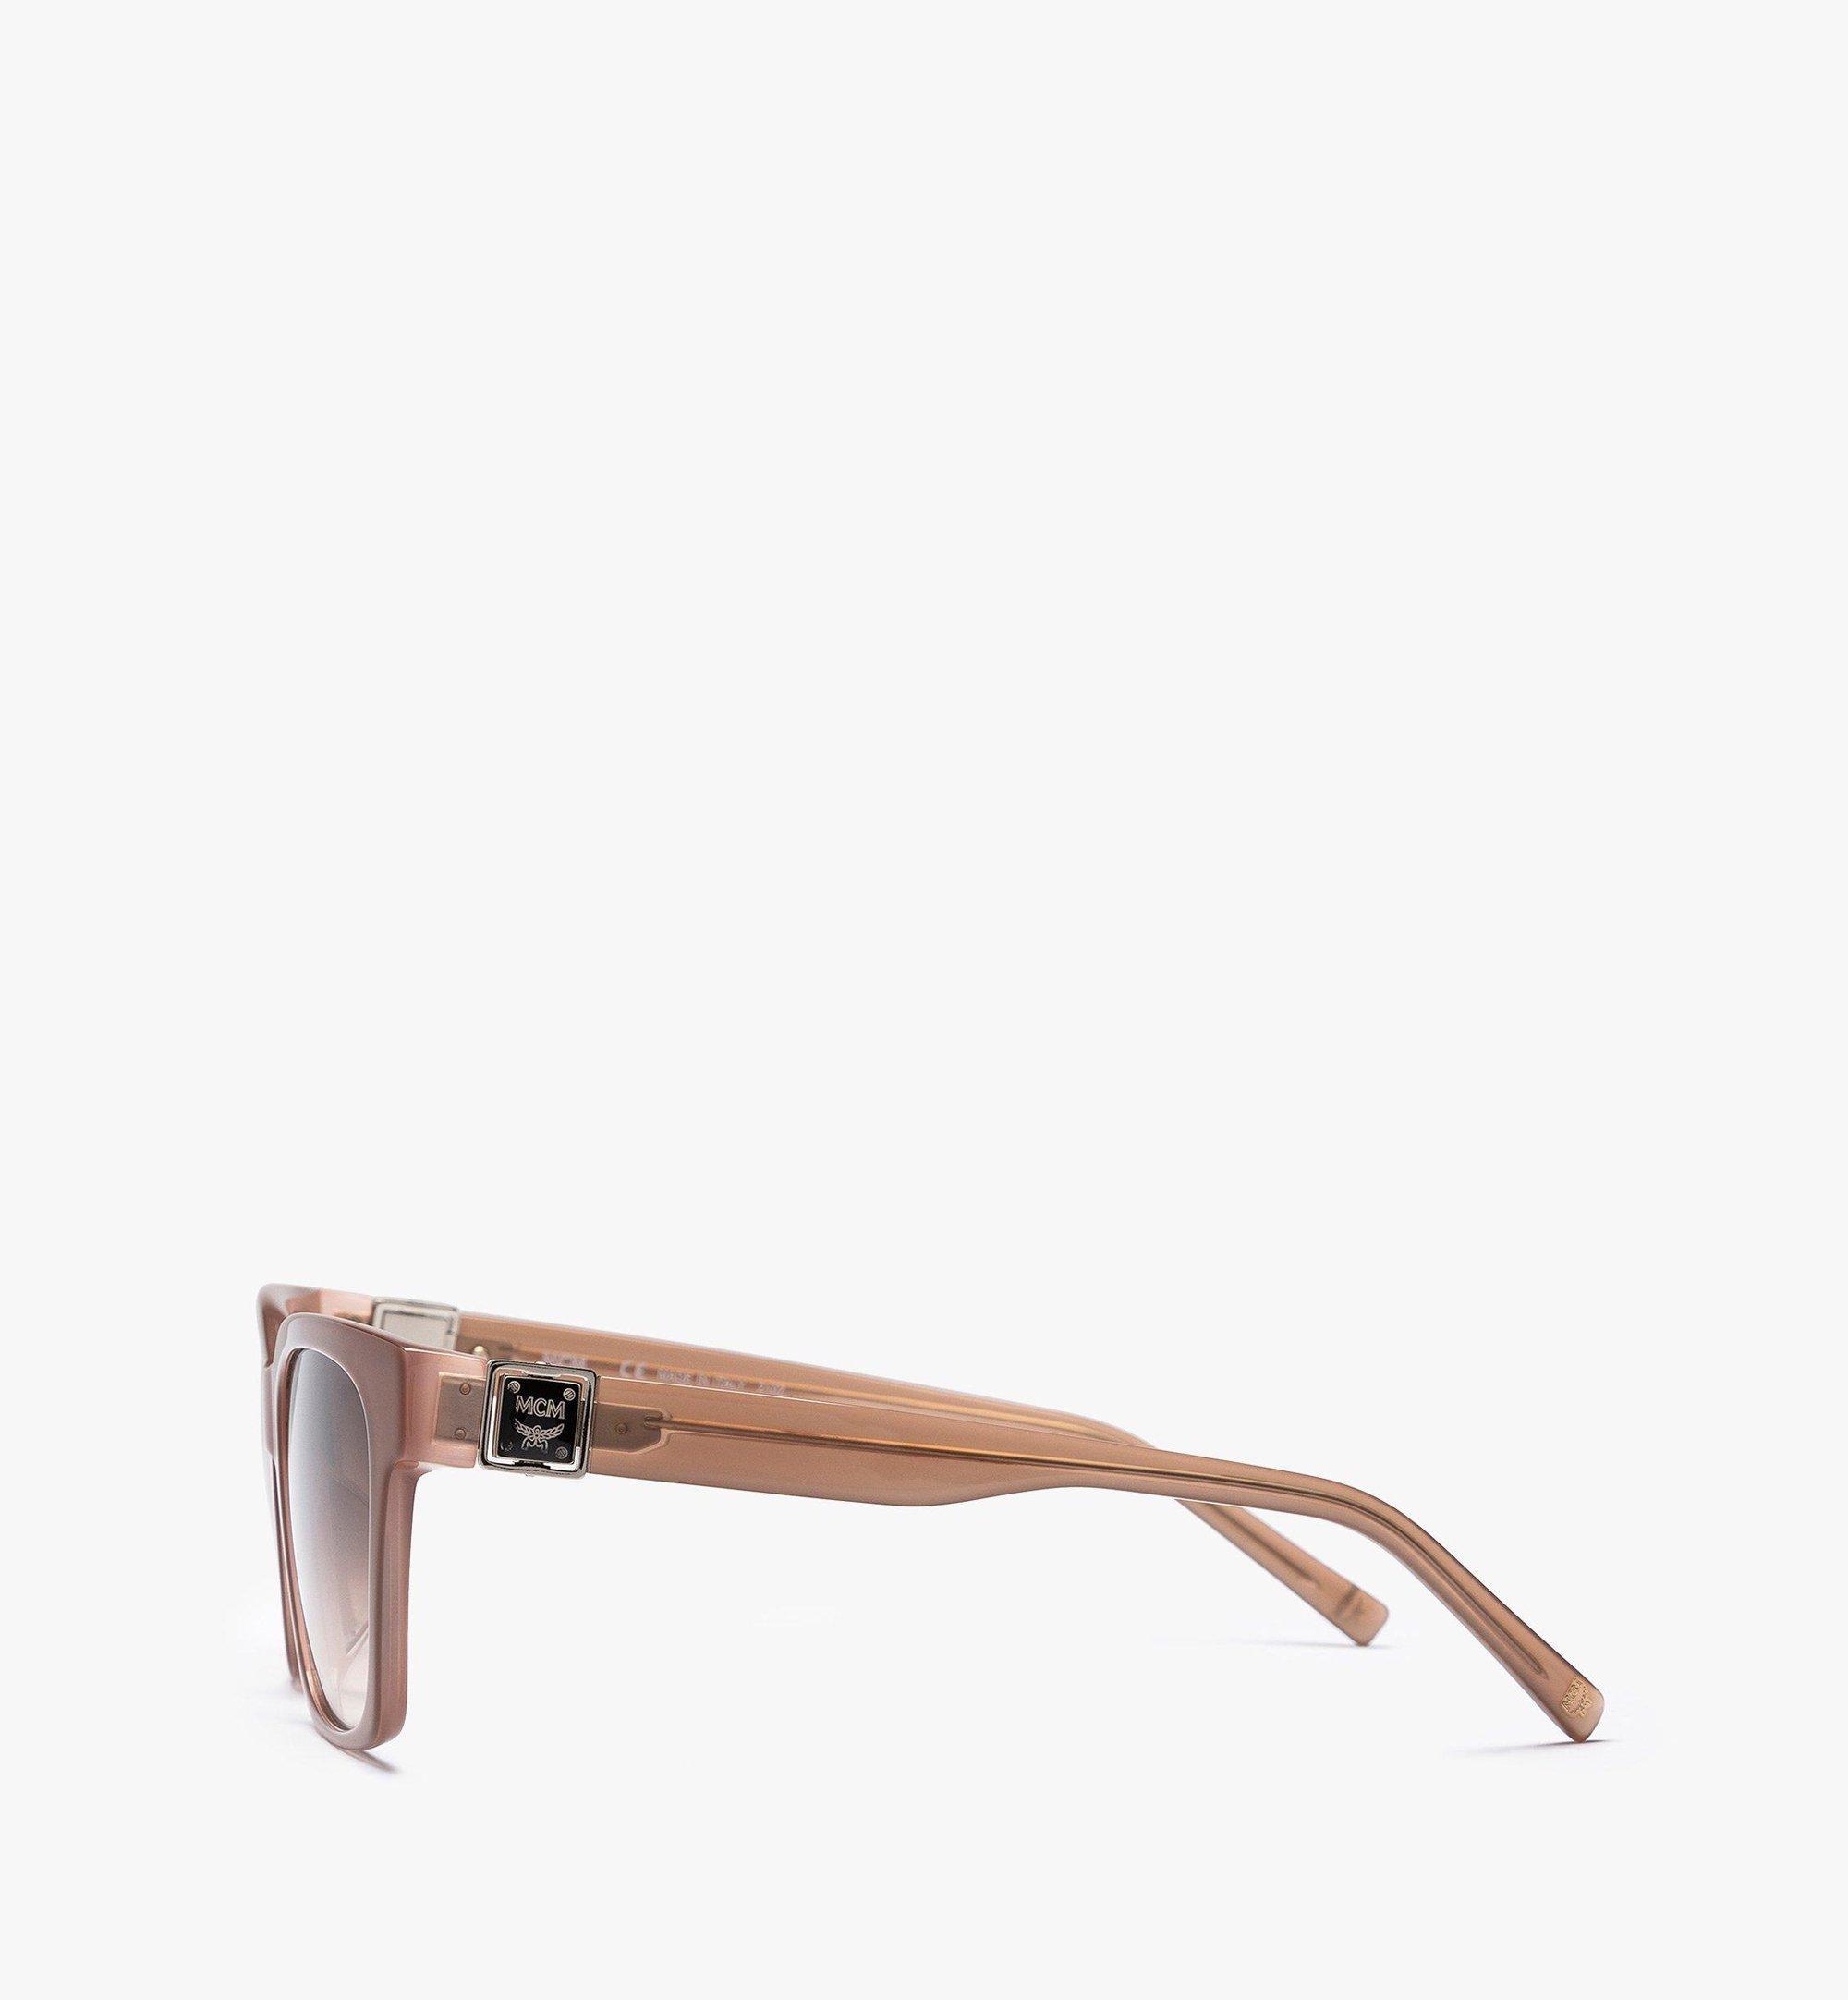 MCM MCM713SA Rectangular Sunglasses Pink MEGBAMM09QG001 Alternate View 1